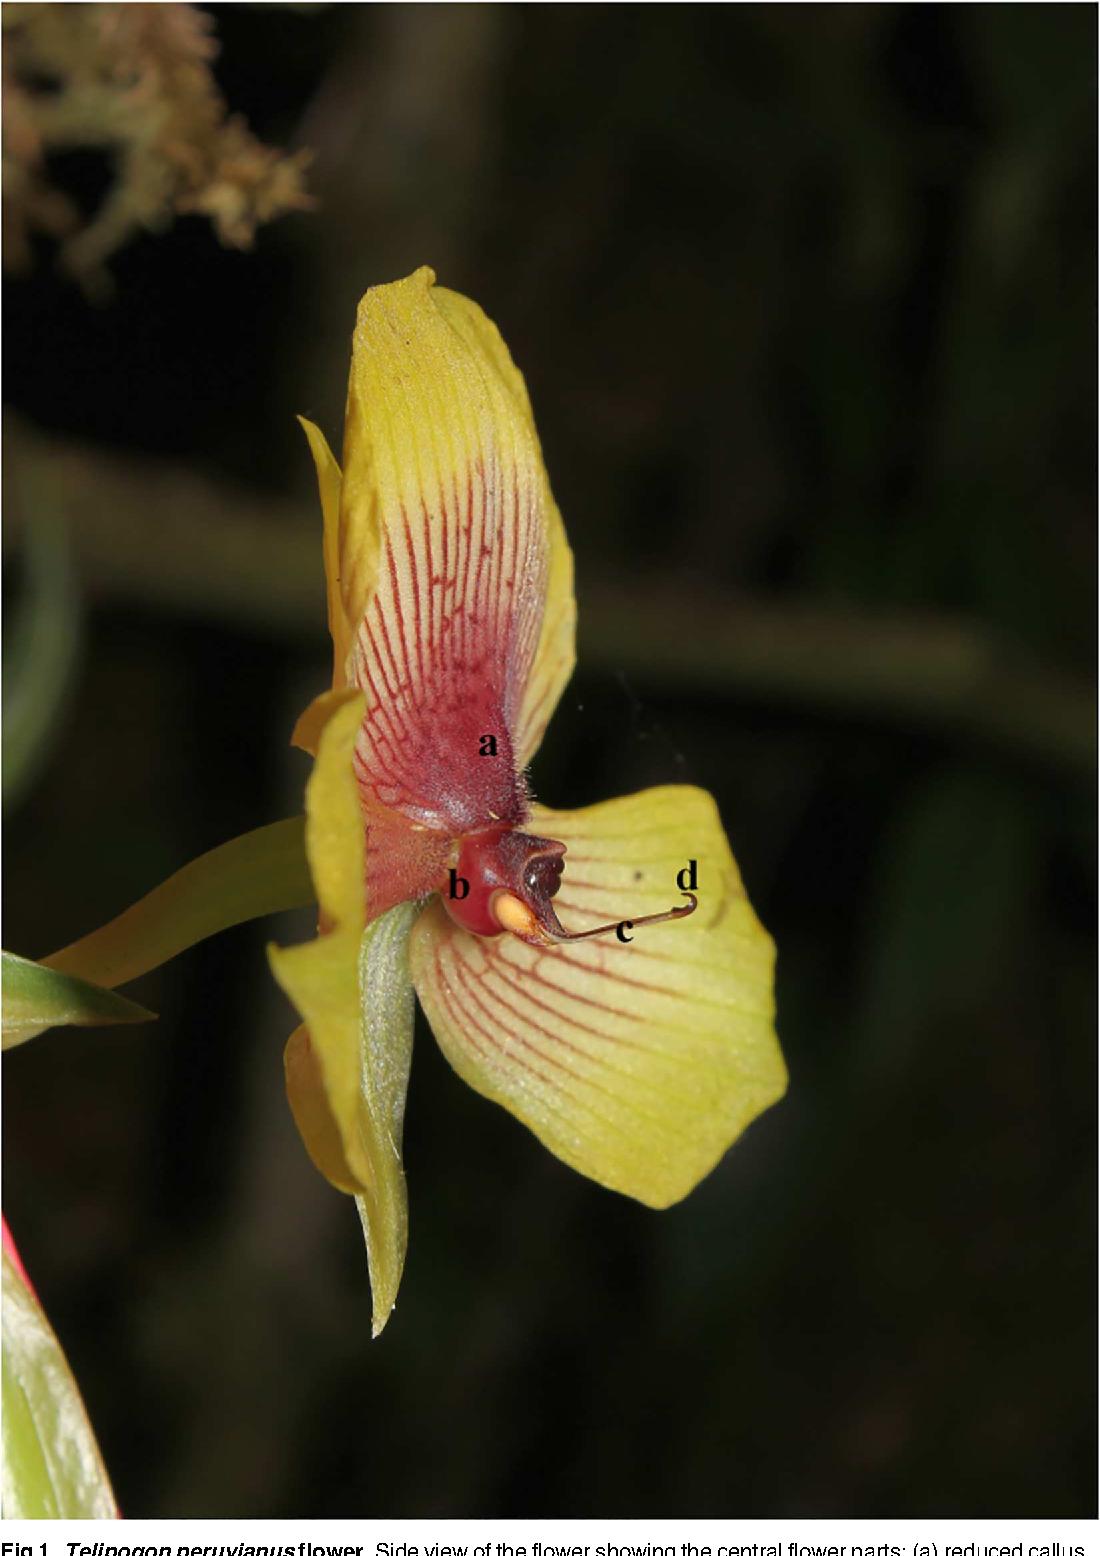 Figure 1 From Telipogon Peruvianus Orchidaceae Flowers Elicit Pre